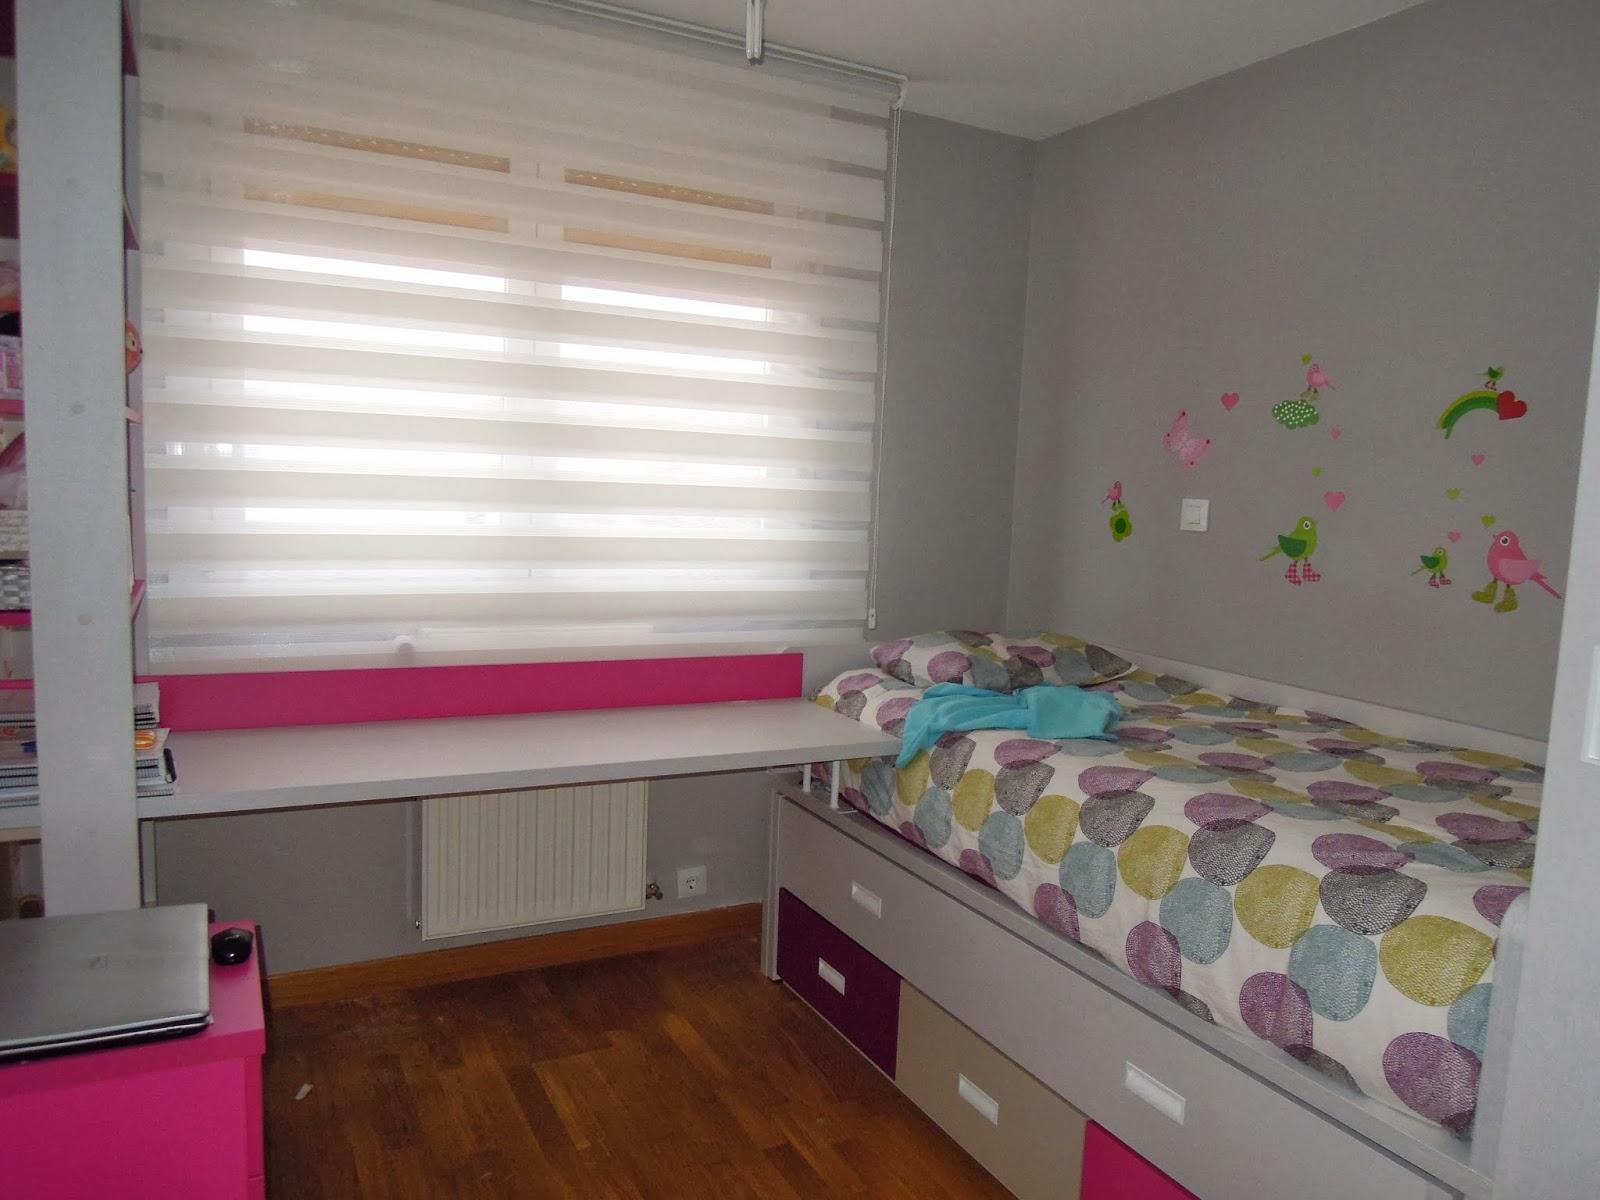 Fotos de cortinas juvenil infantil 2014 - Cortinas screen leroy merlin ...